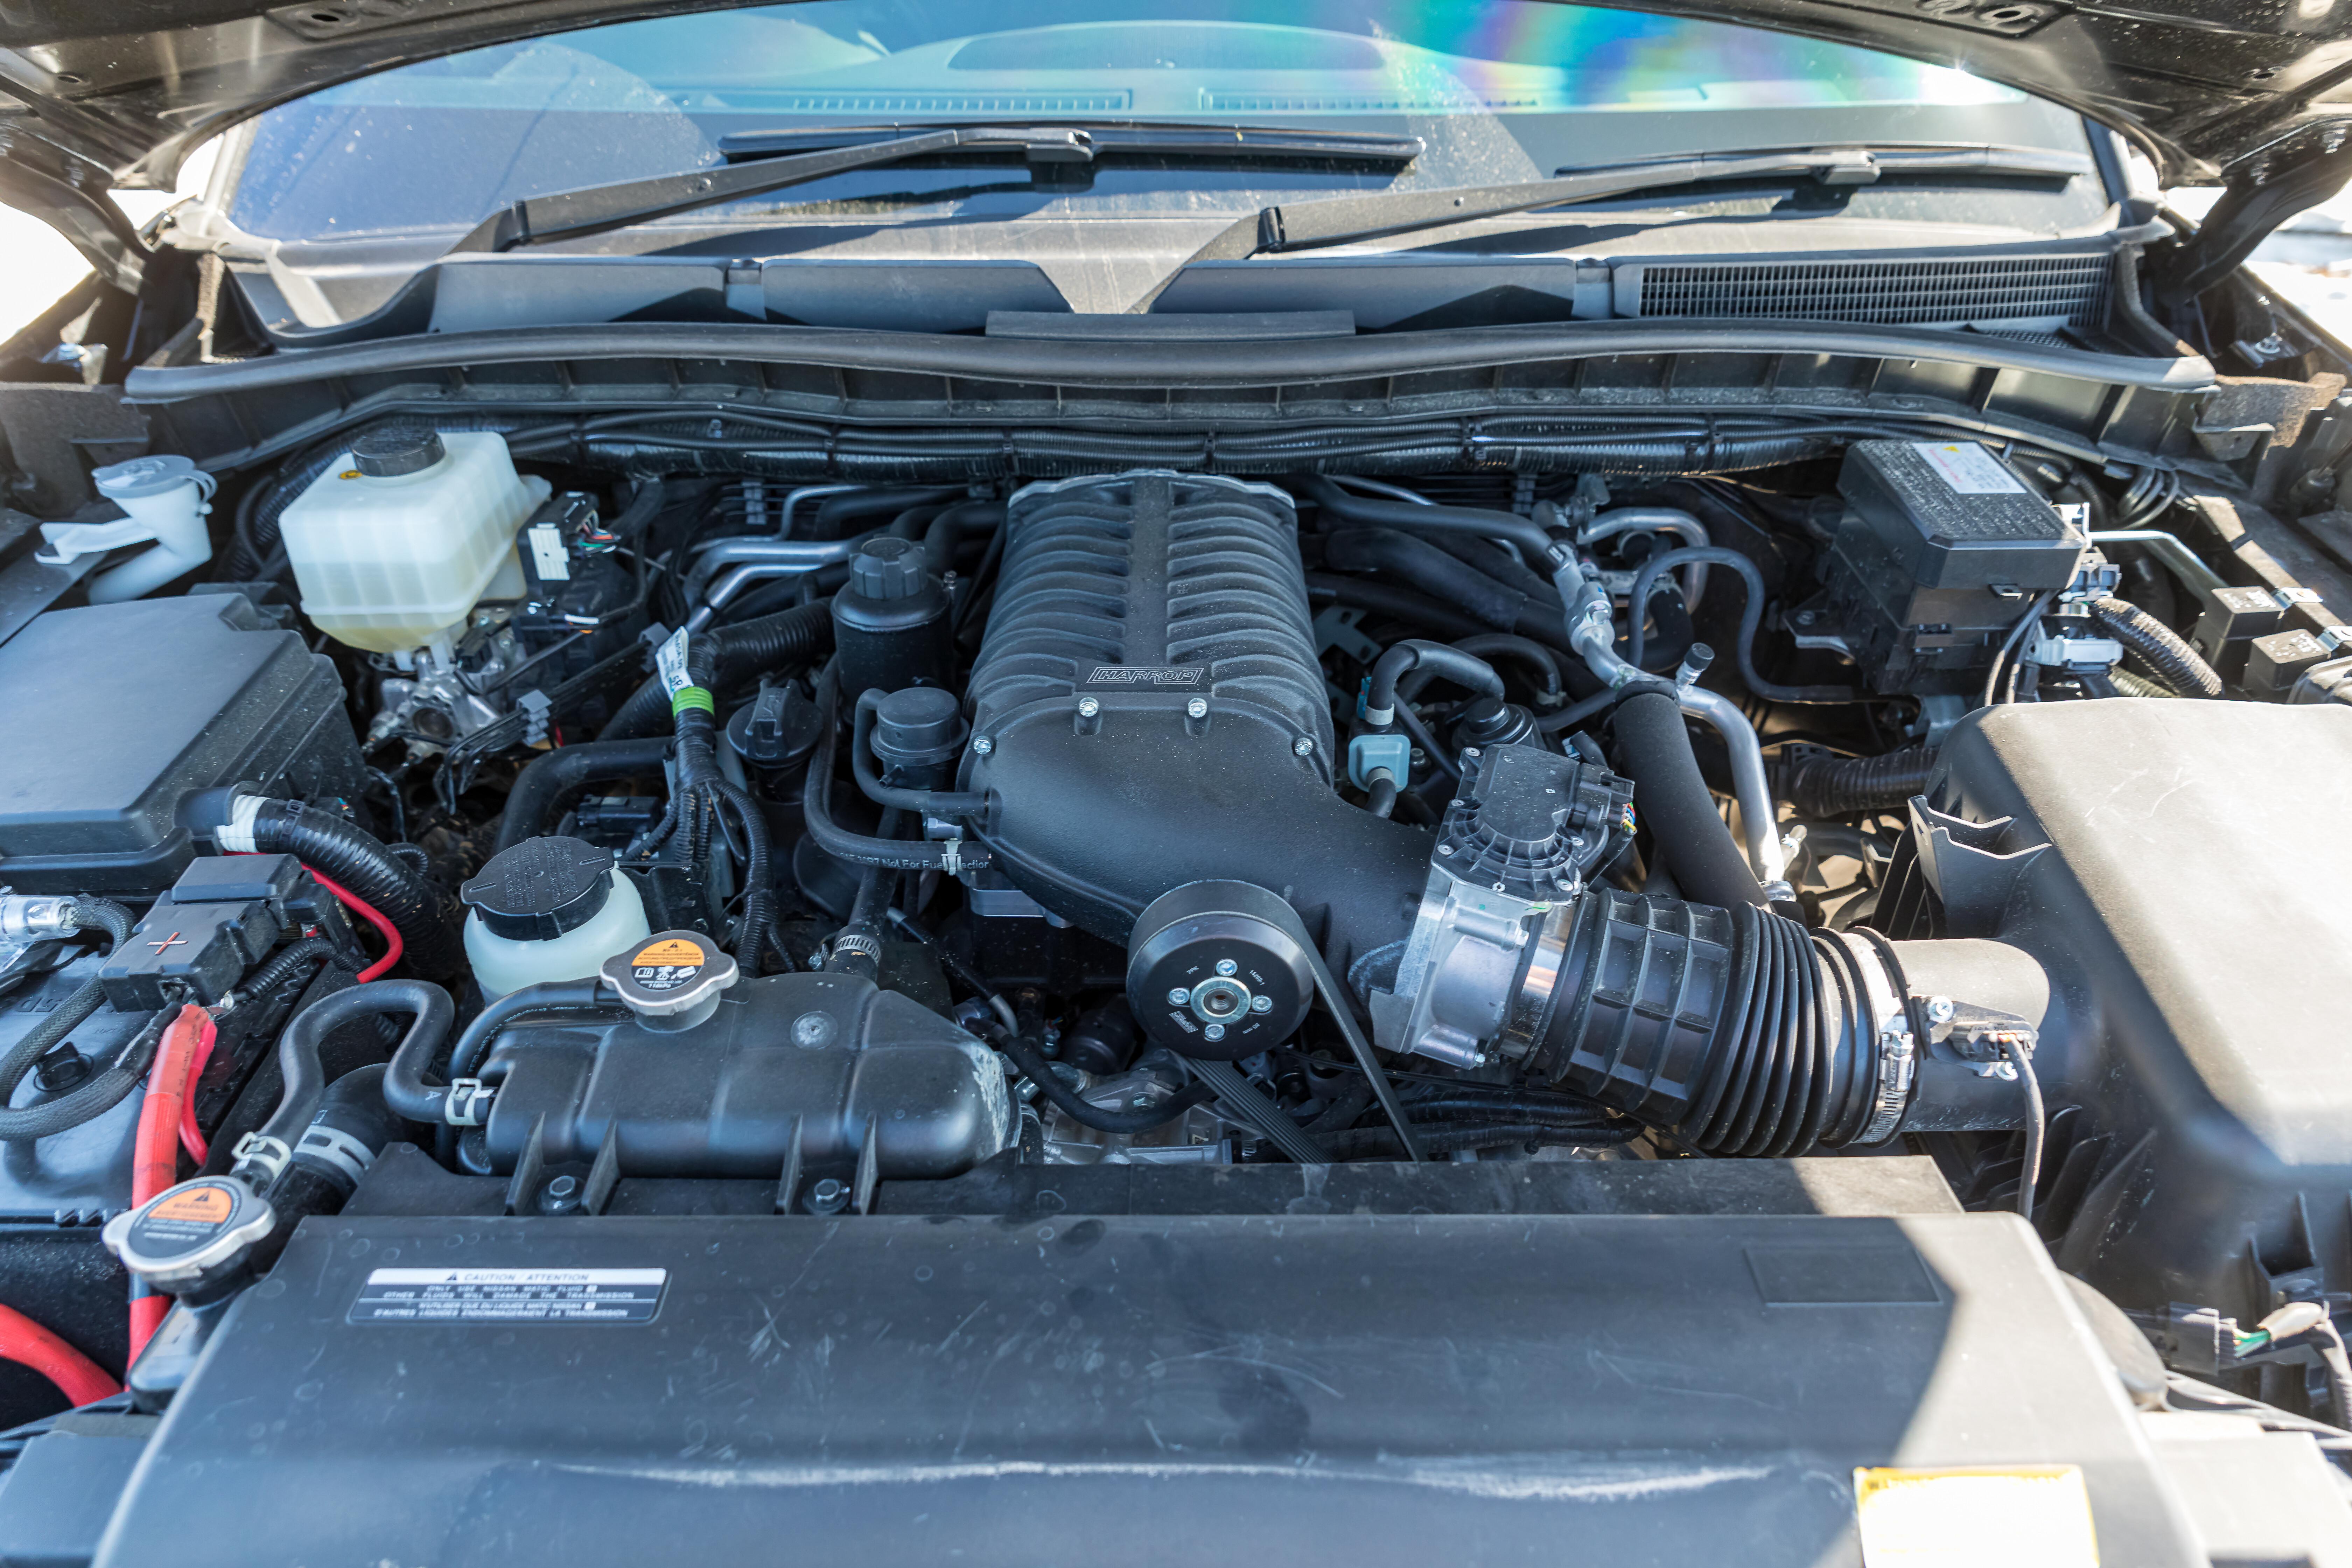 4 X 4 Australia Reviews 2021 September 2021 Custom Nissan Y 62 Patrol Engine Bay